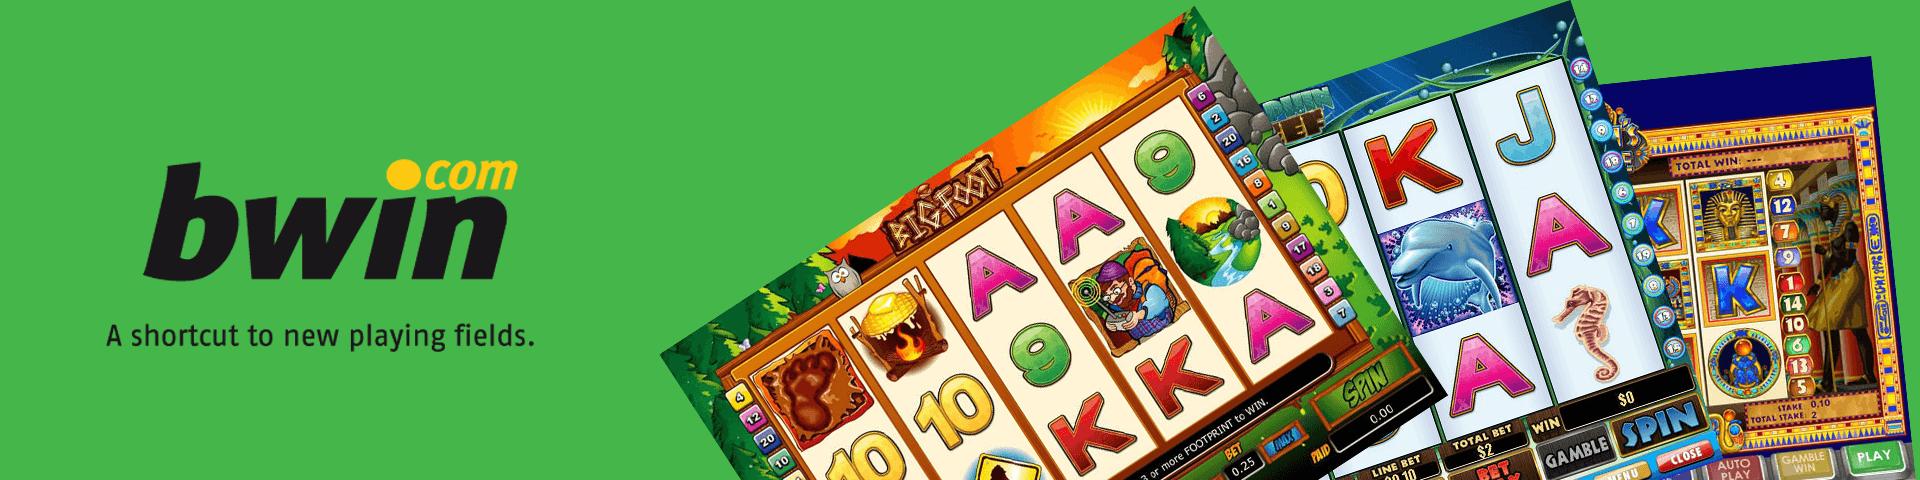 jocuri-casino-Bwin-multabafta-slider